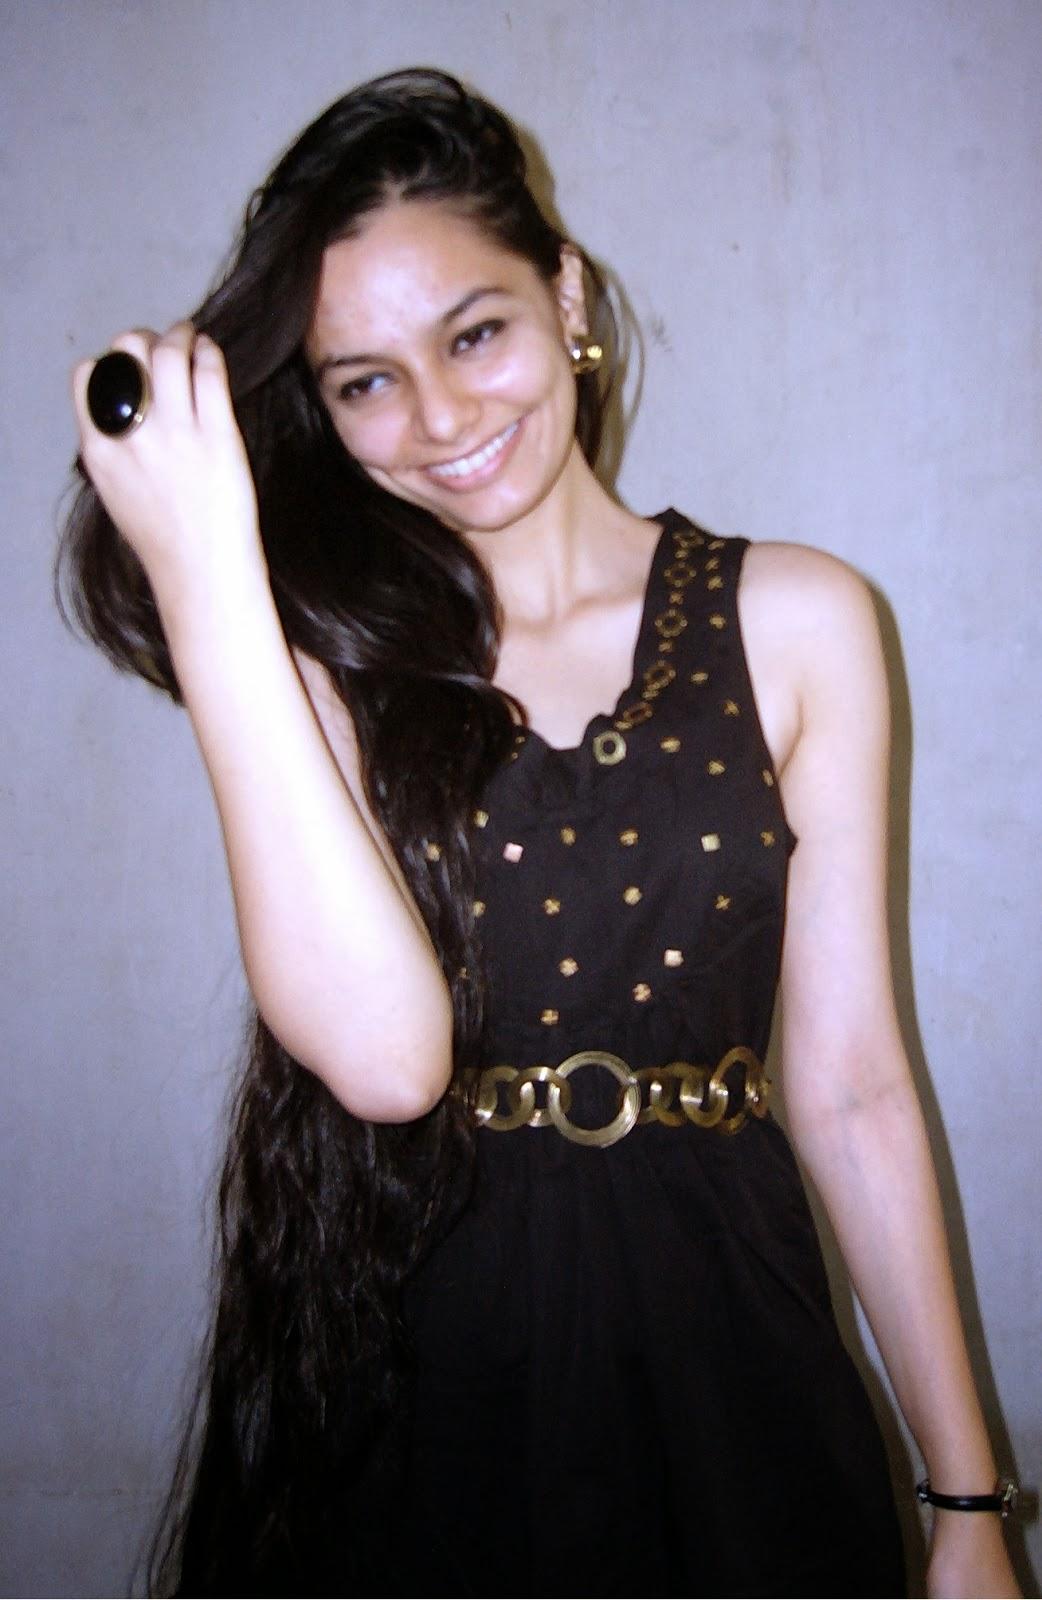 mumbai fashion blogger, mumbai streetstyle, desi, long hair, LBD